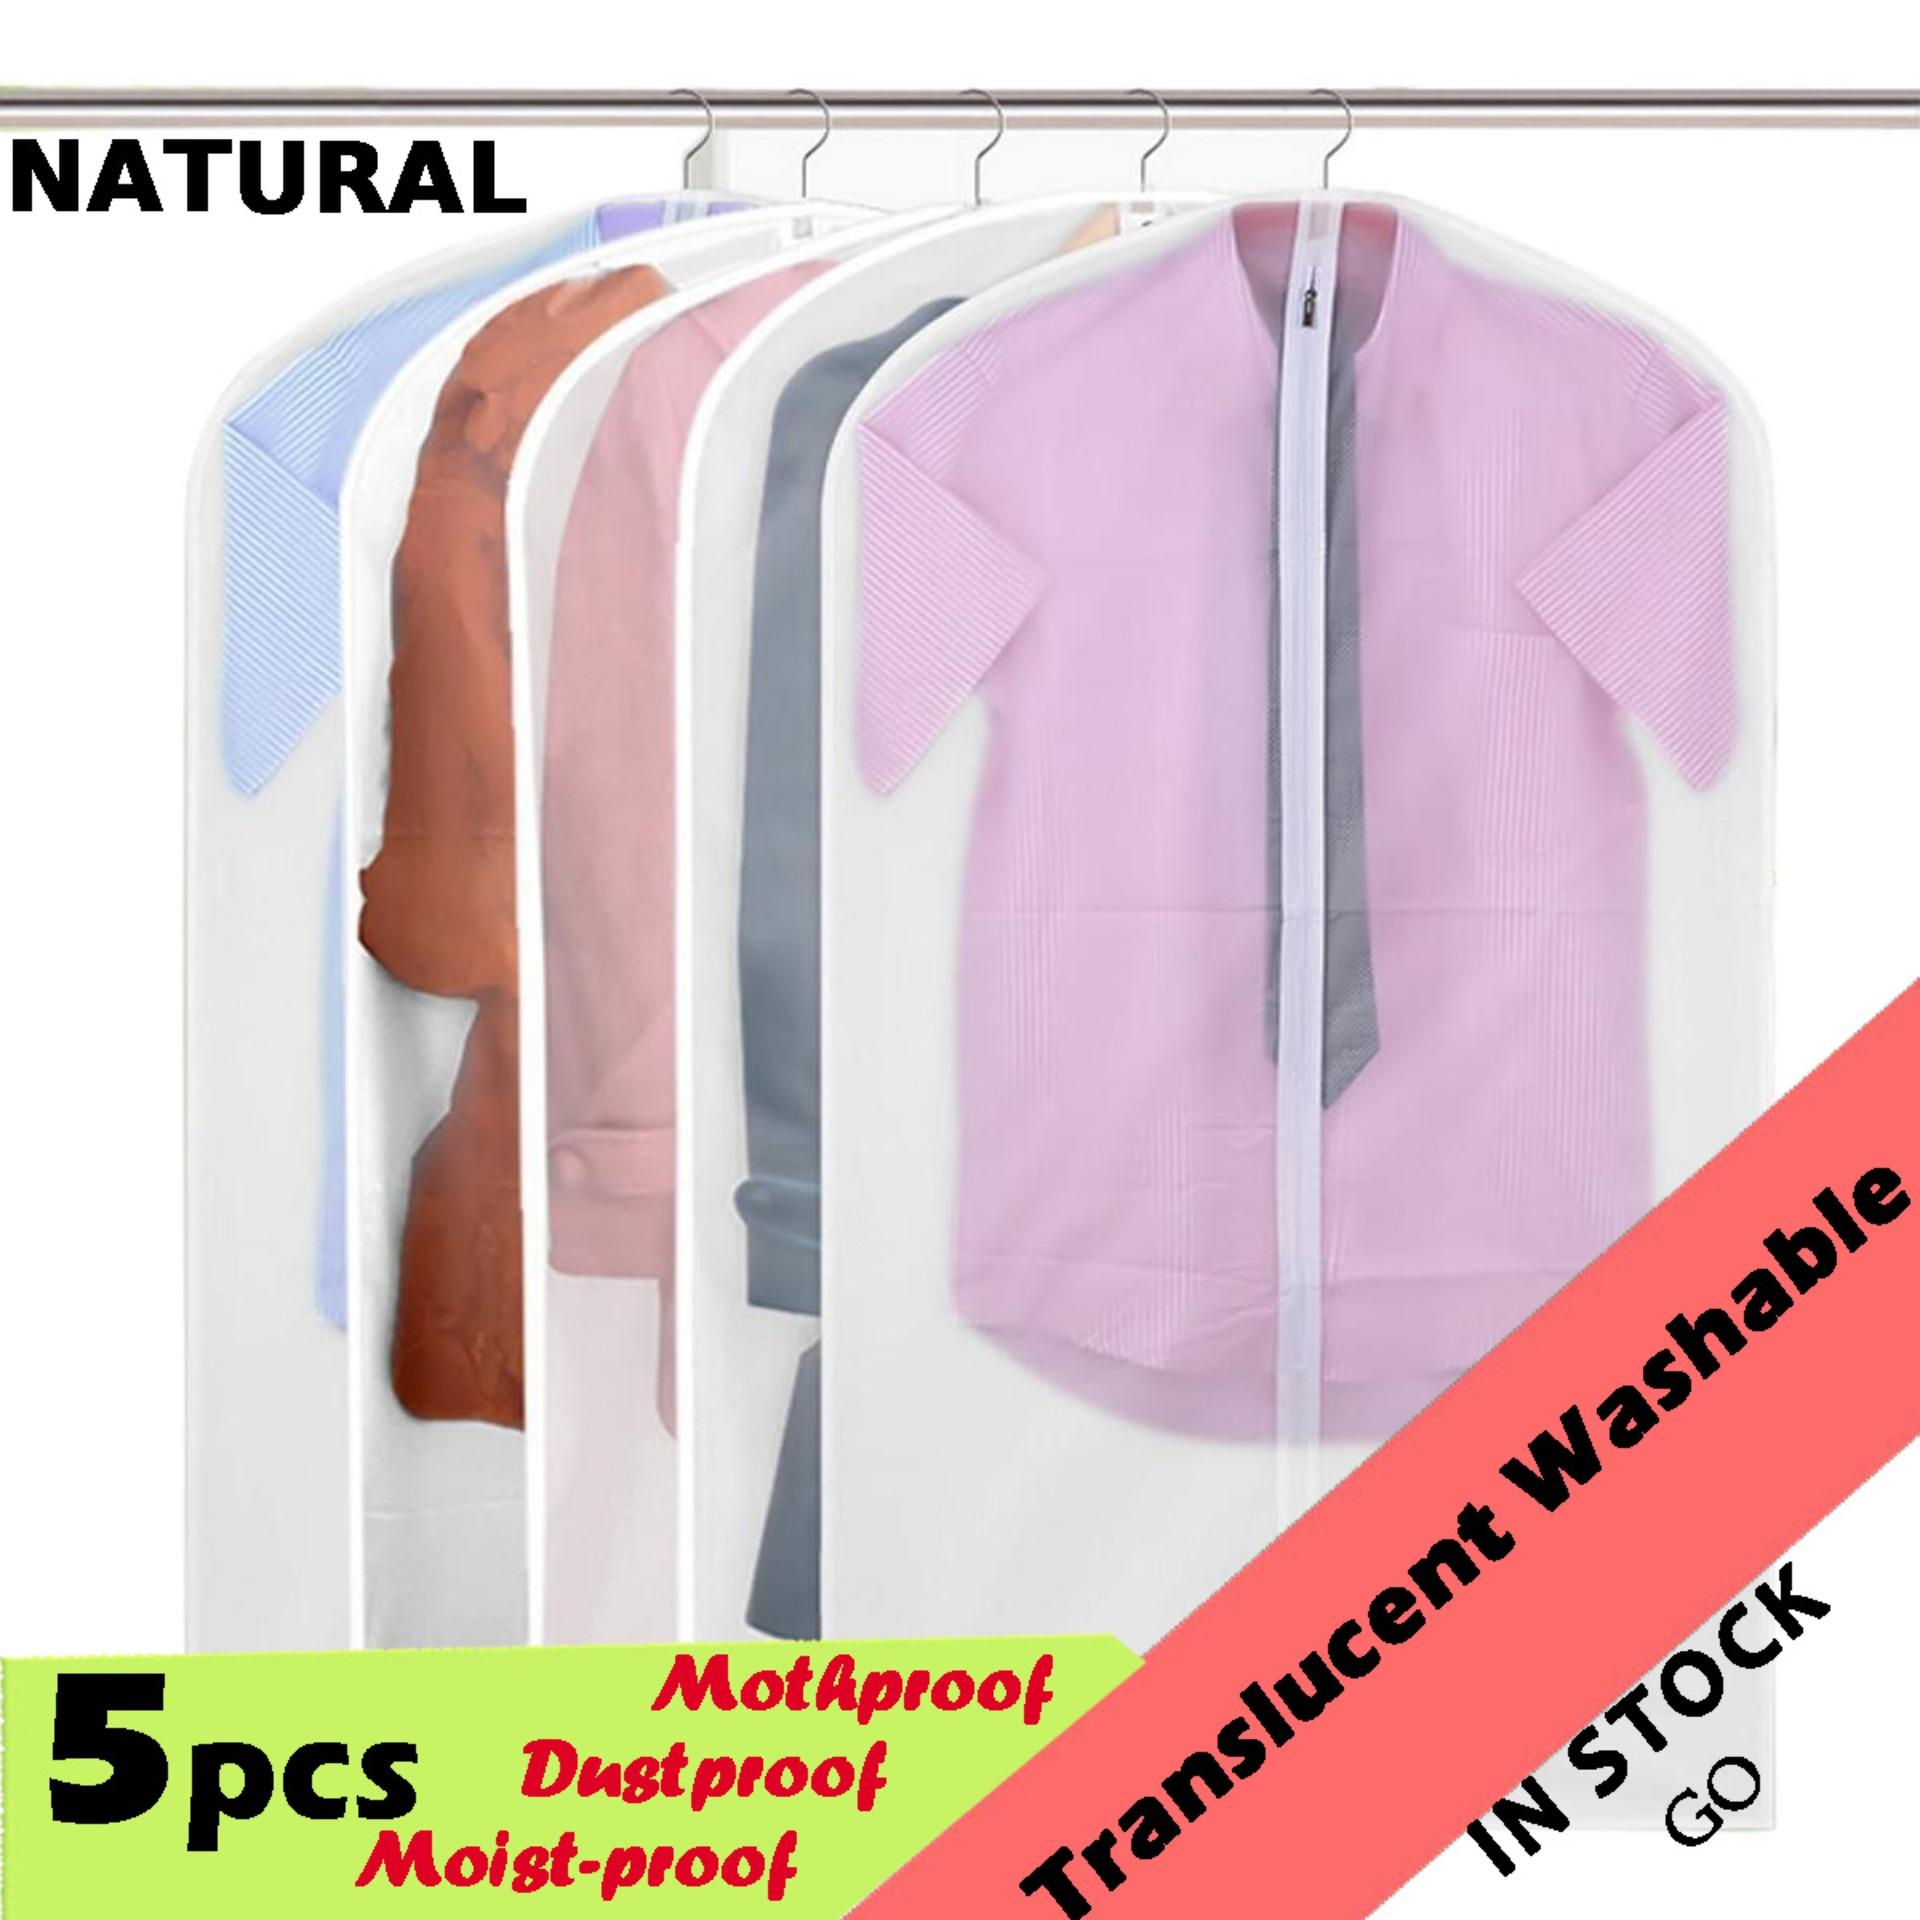 5 Pcs Translucent Peva Coat Dress Jacket Garment Clothes Protective Washable Dust Proof Cover Bag S - Intl By Duha.